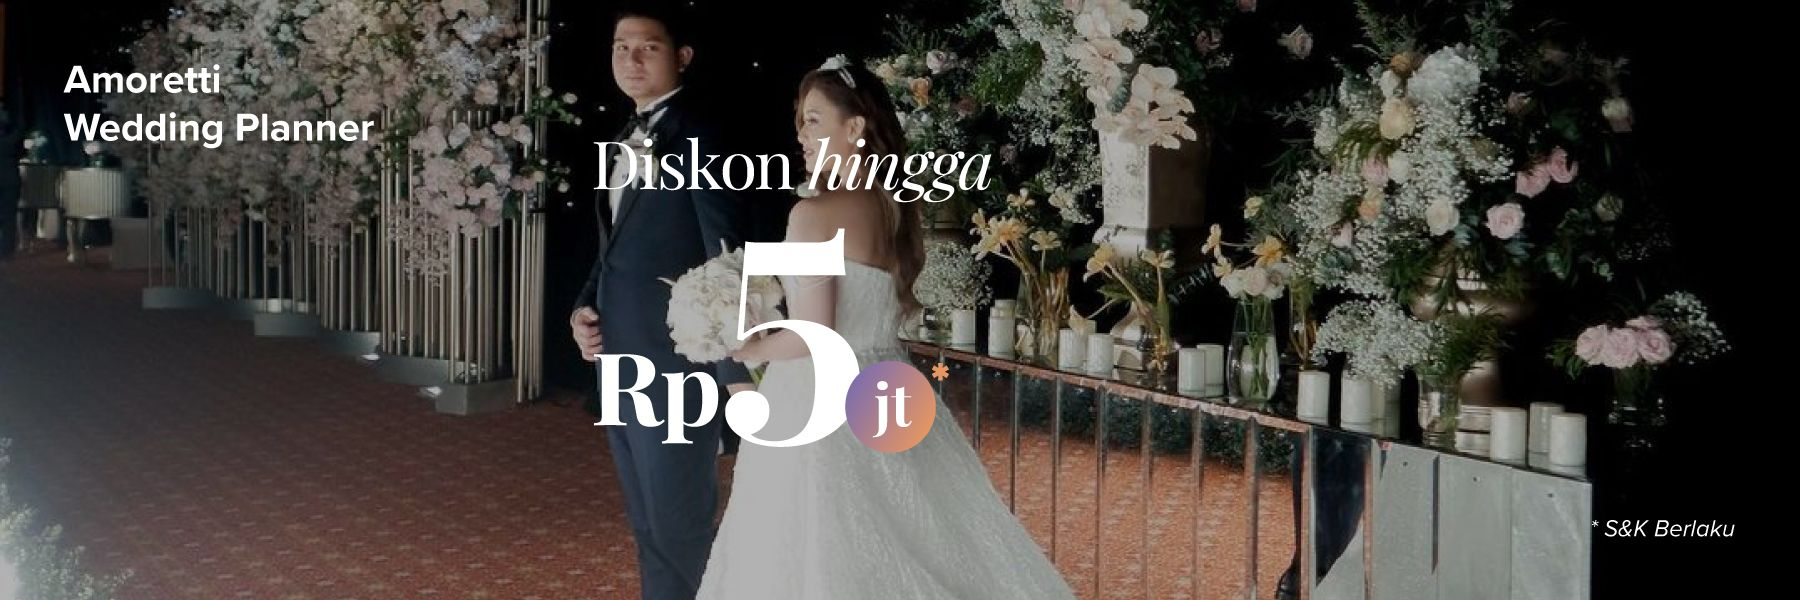 Penawaran Spesial Wedding Organizer bersama Amoretti Wedding